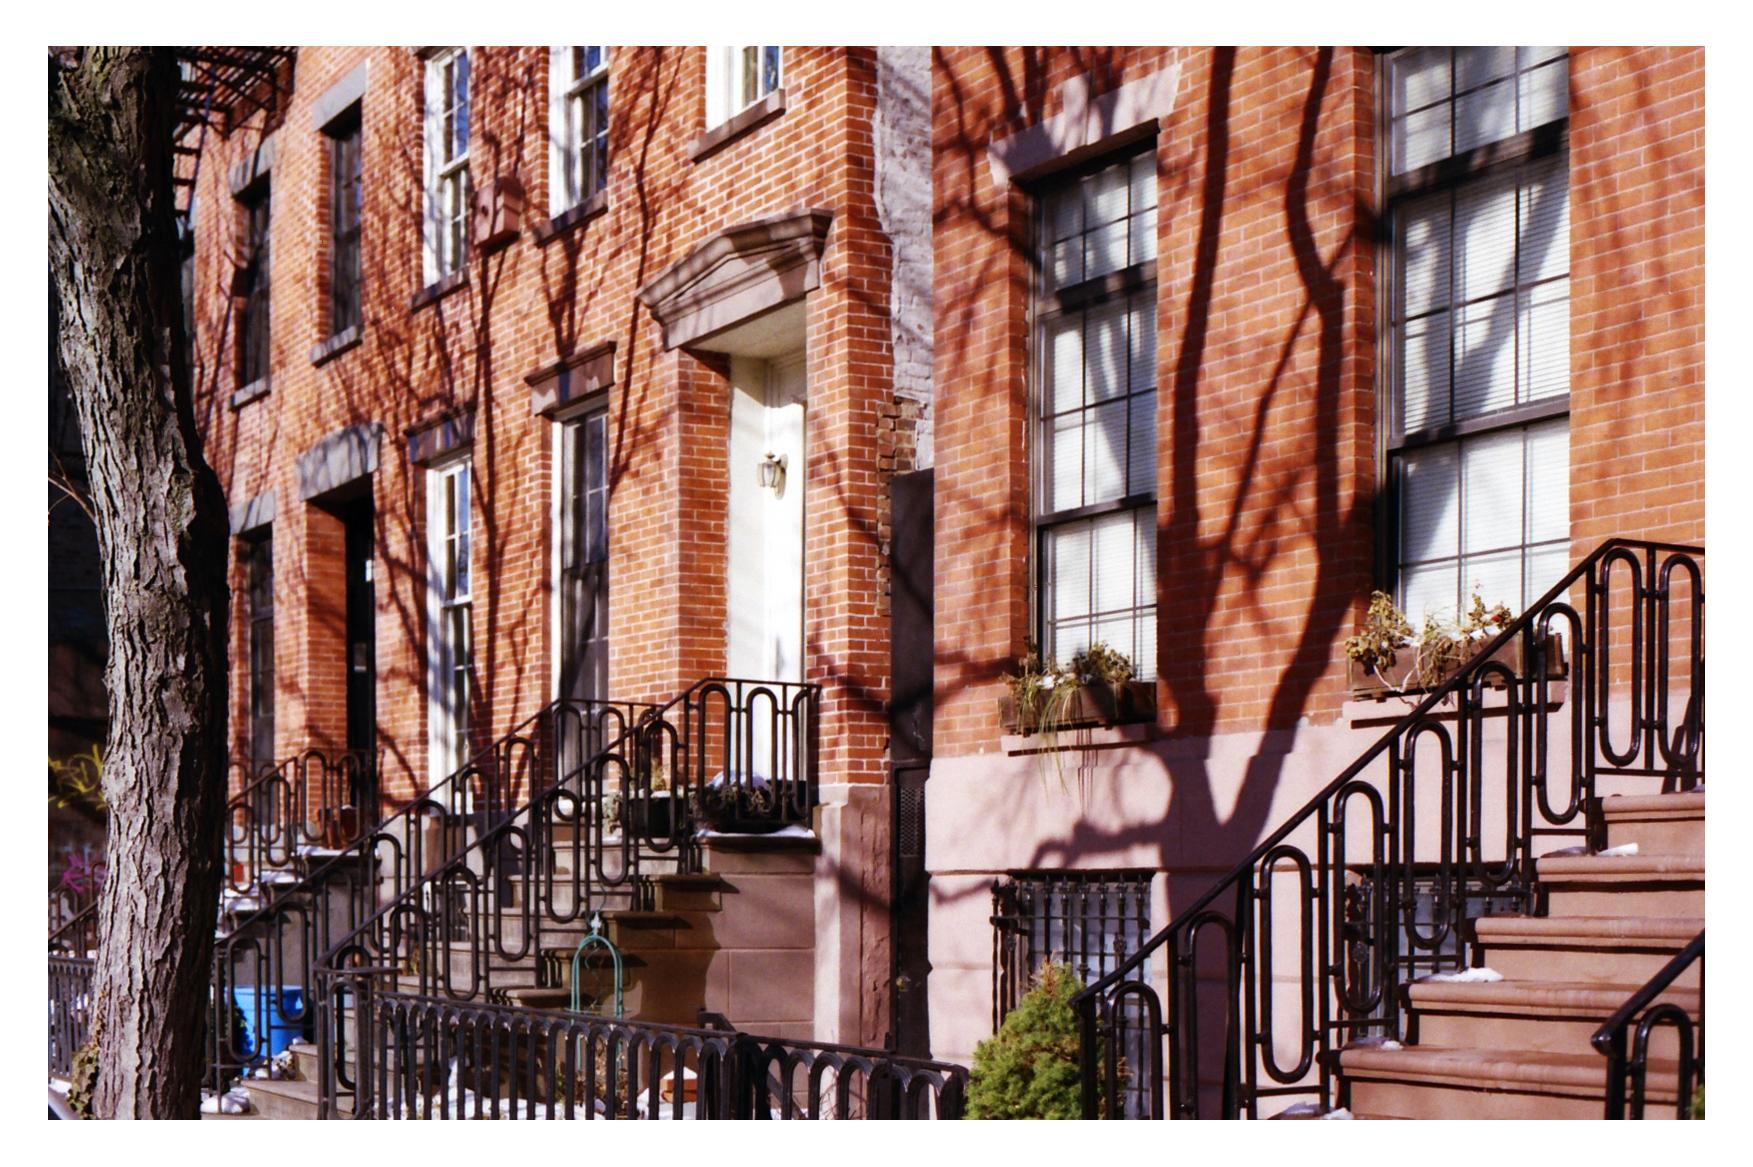 New_York_1 copy.jpg